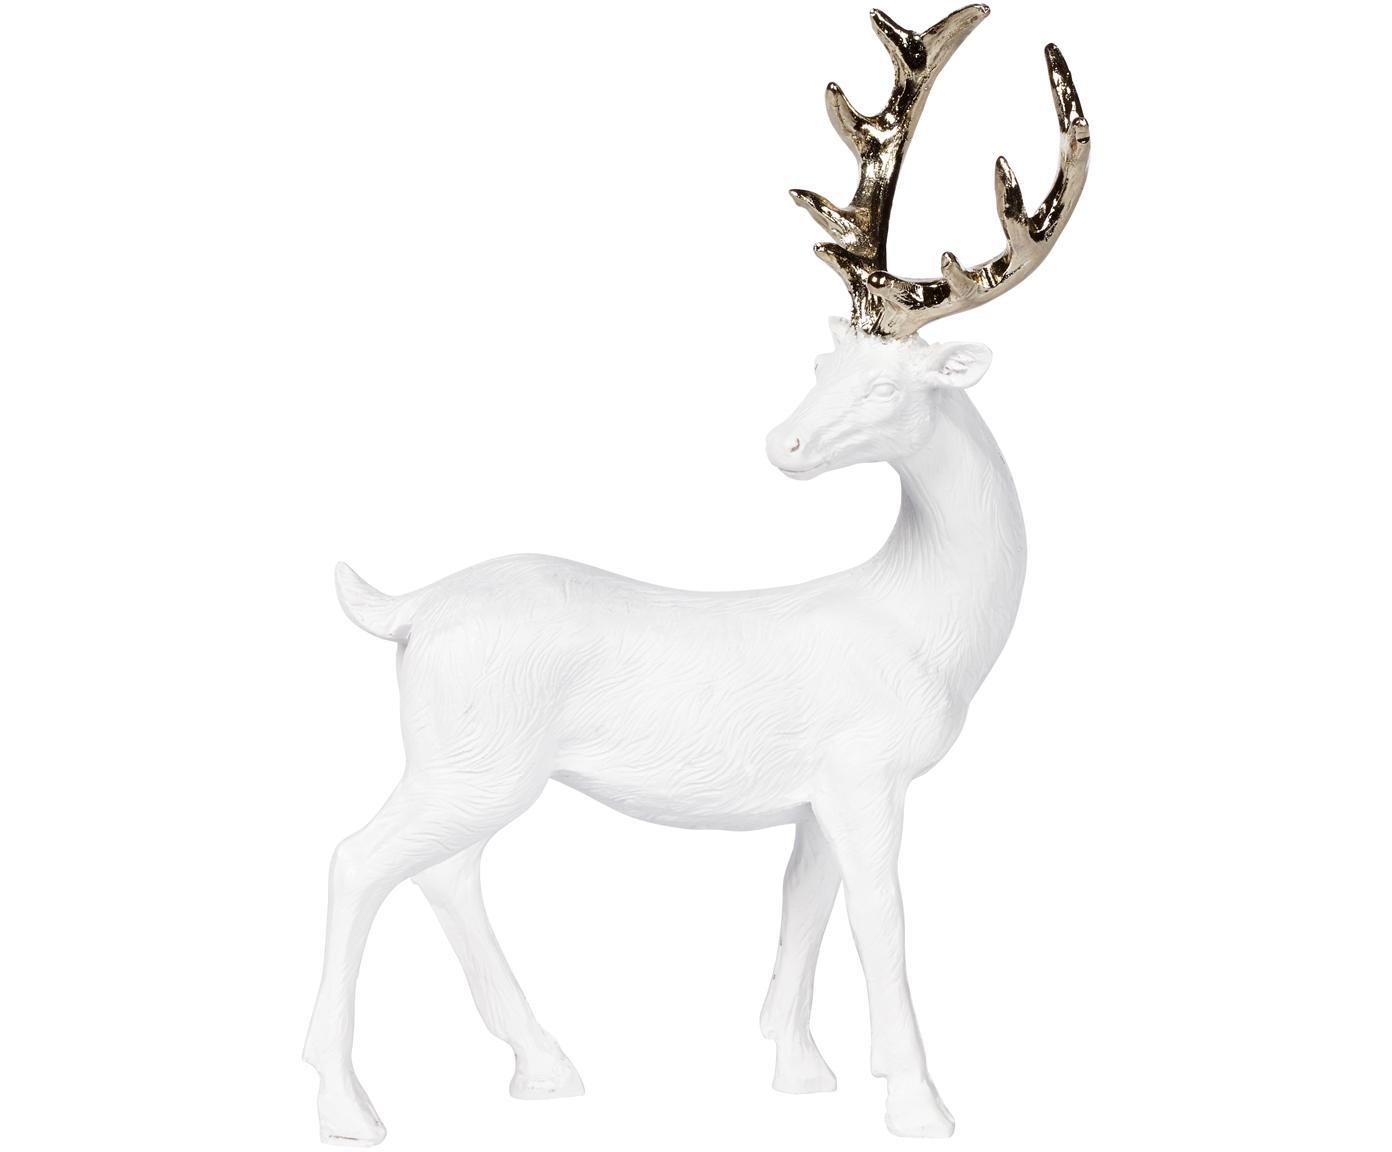 Handgefertigtes Deko-Objekt Deer, Polyresin, Weiss, Goldfarben, 9 x 14 cm